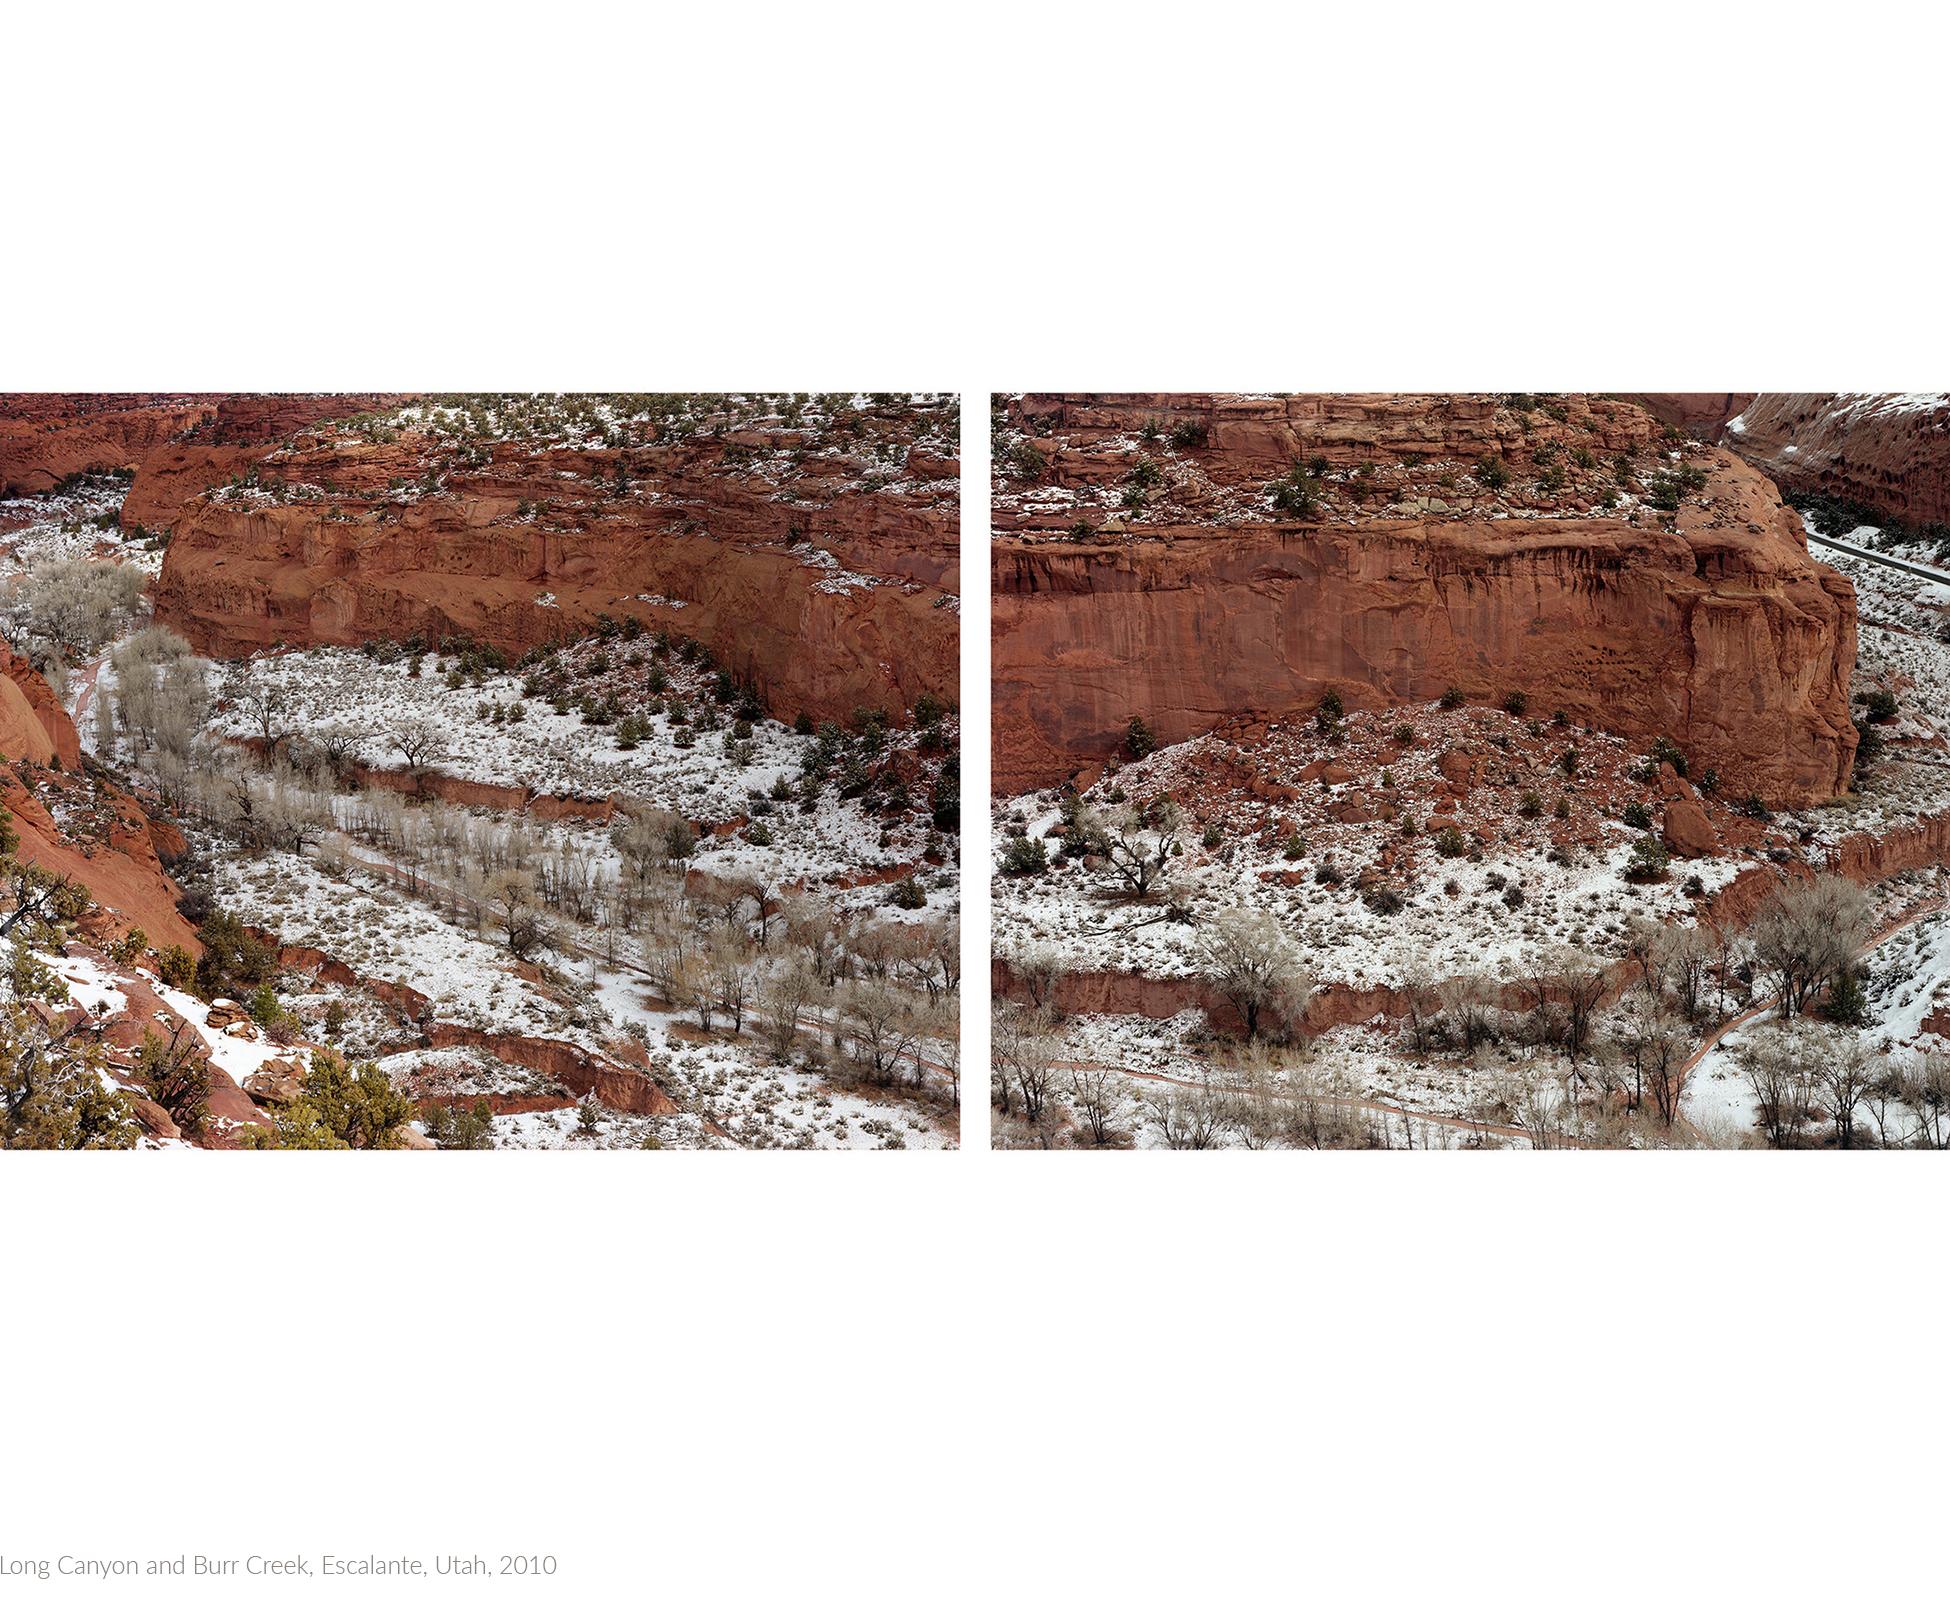 Long+Canyon+and+Burr+Creek,+Escalante,+Utah,+2010+copytitledsamesize.jpg